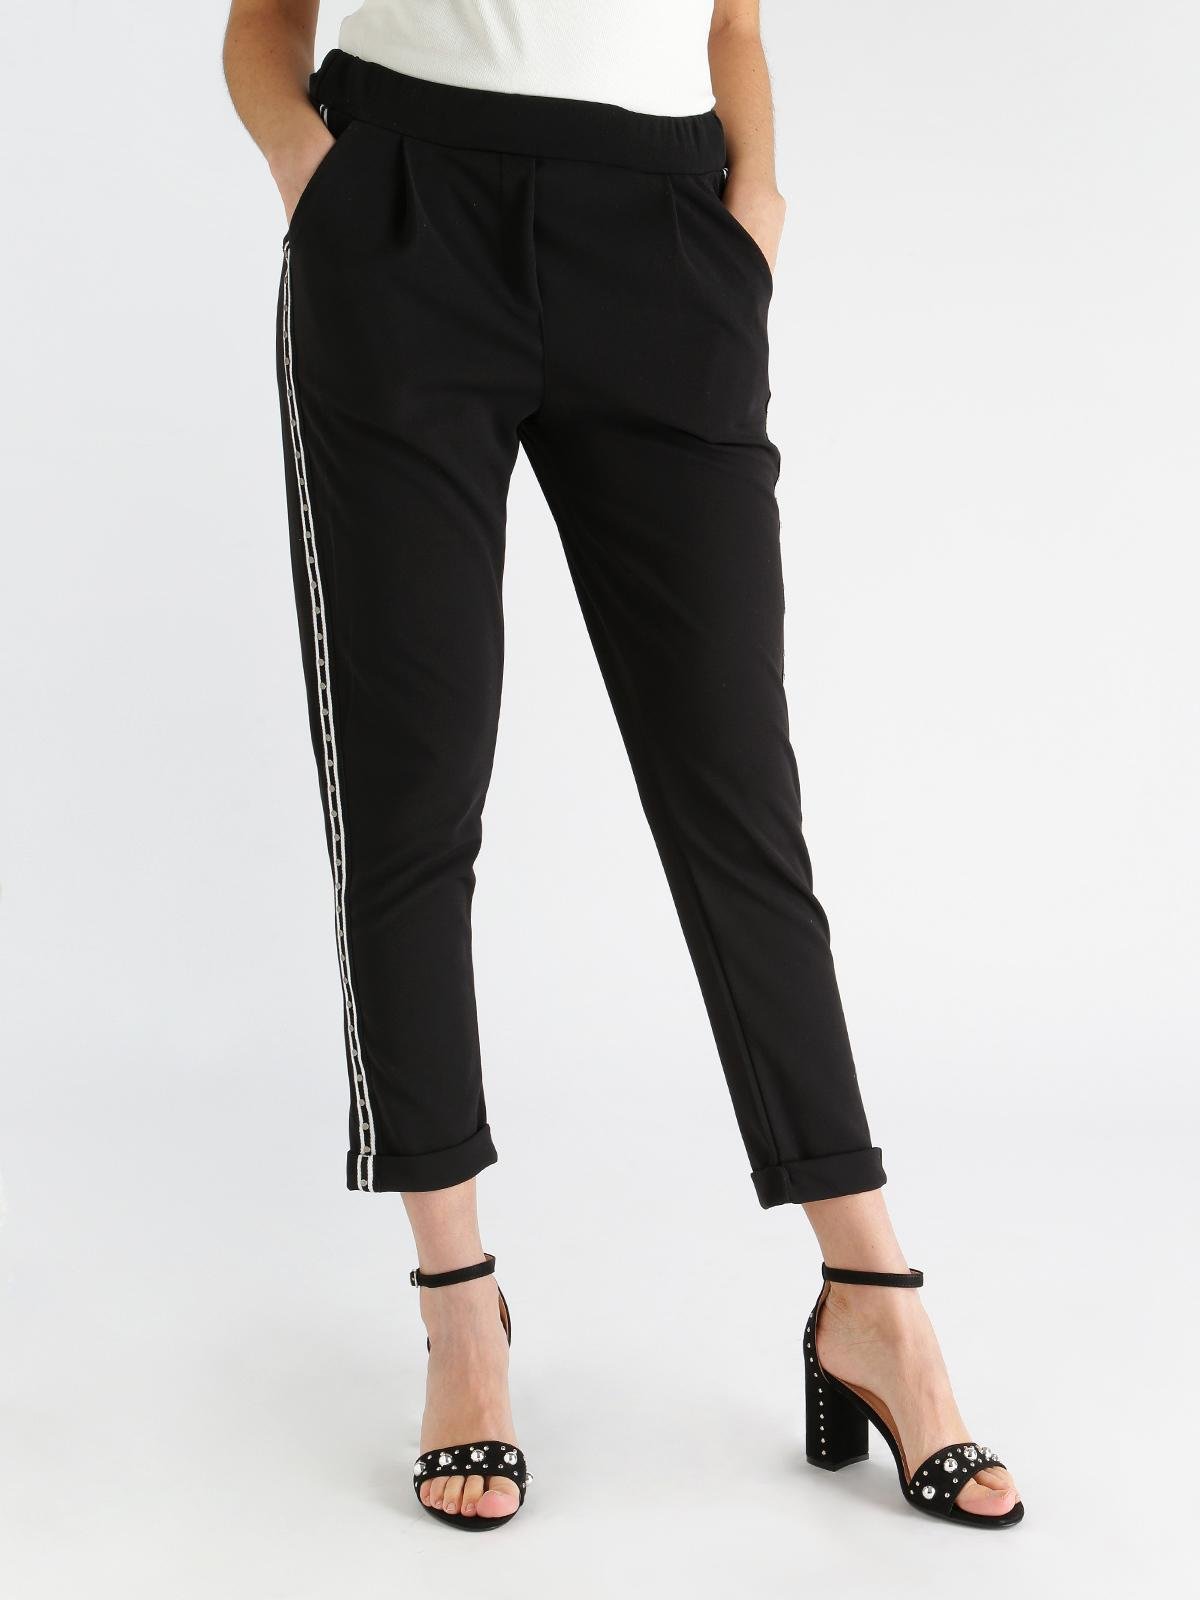 a18bafb00a Pantaloni con striscia laterale e borchie new collection | MecShopping